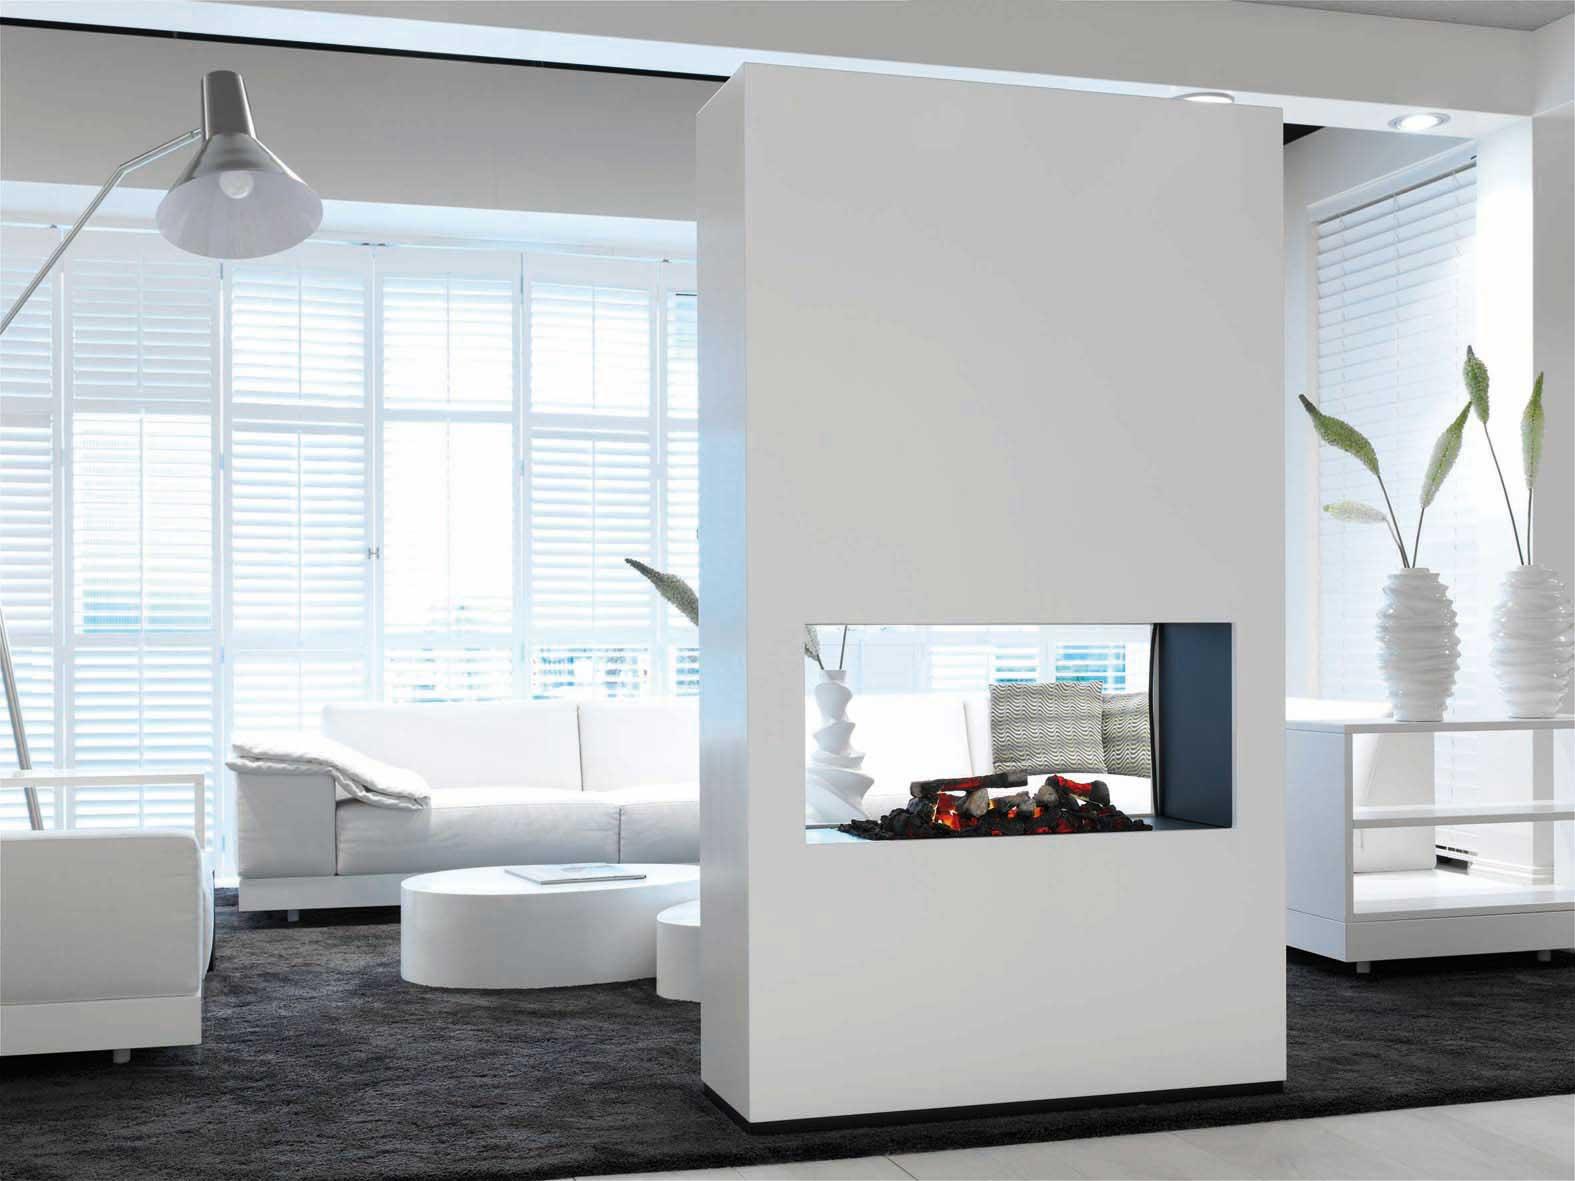 ruby fires bioethanol kamin ambiance kaufen im borono online shop. Black Bedroom Furniture Sets. Home Design Ideas